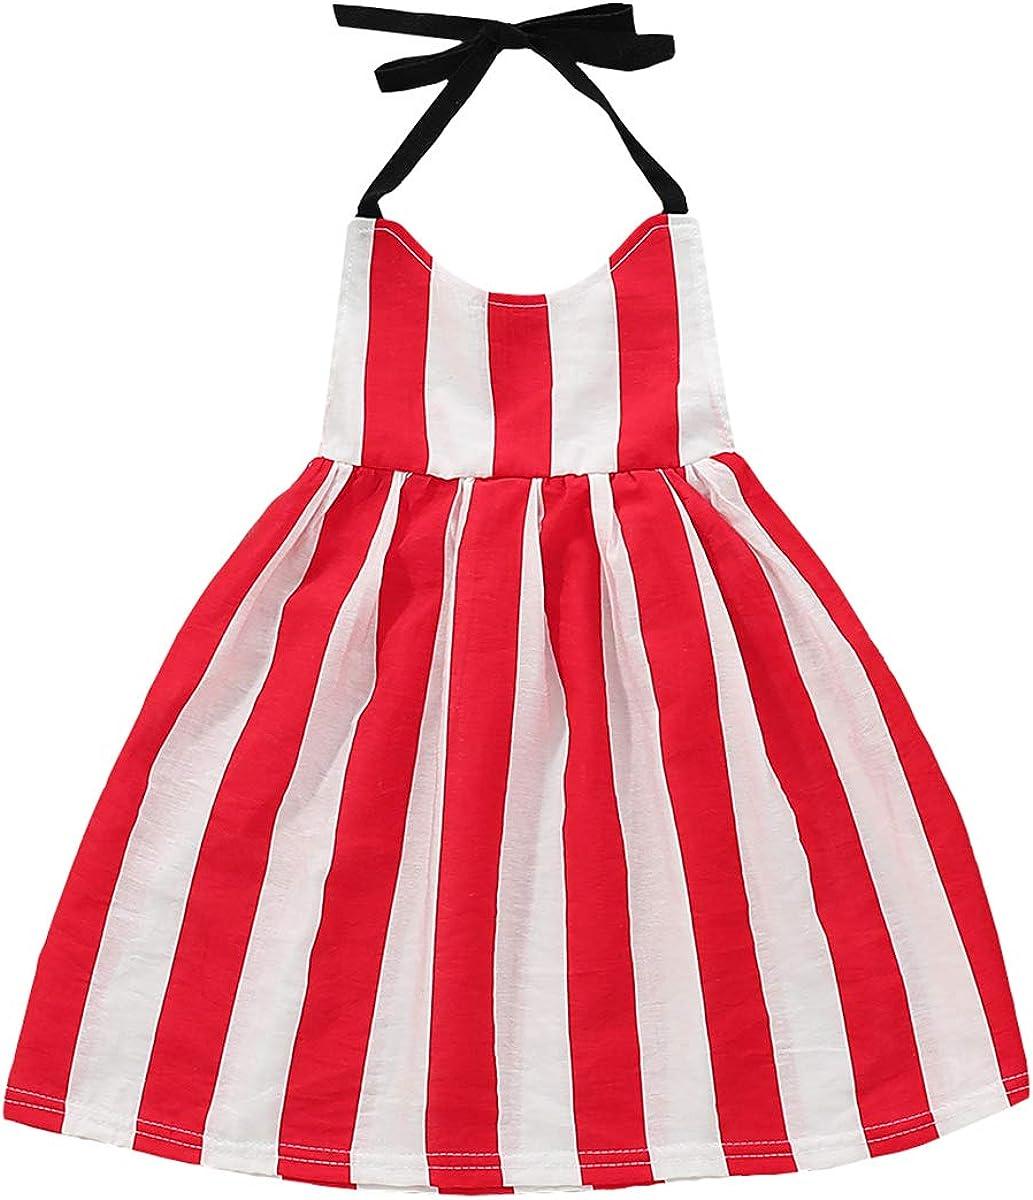 DaMohony Little Girls Dress Casual Stripe Print Sleeveless Halter Dress Girls Summer Party Princess Dress for 1-5 Years